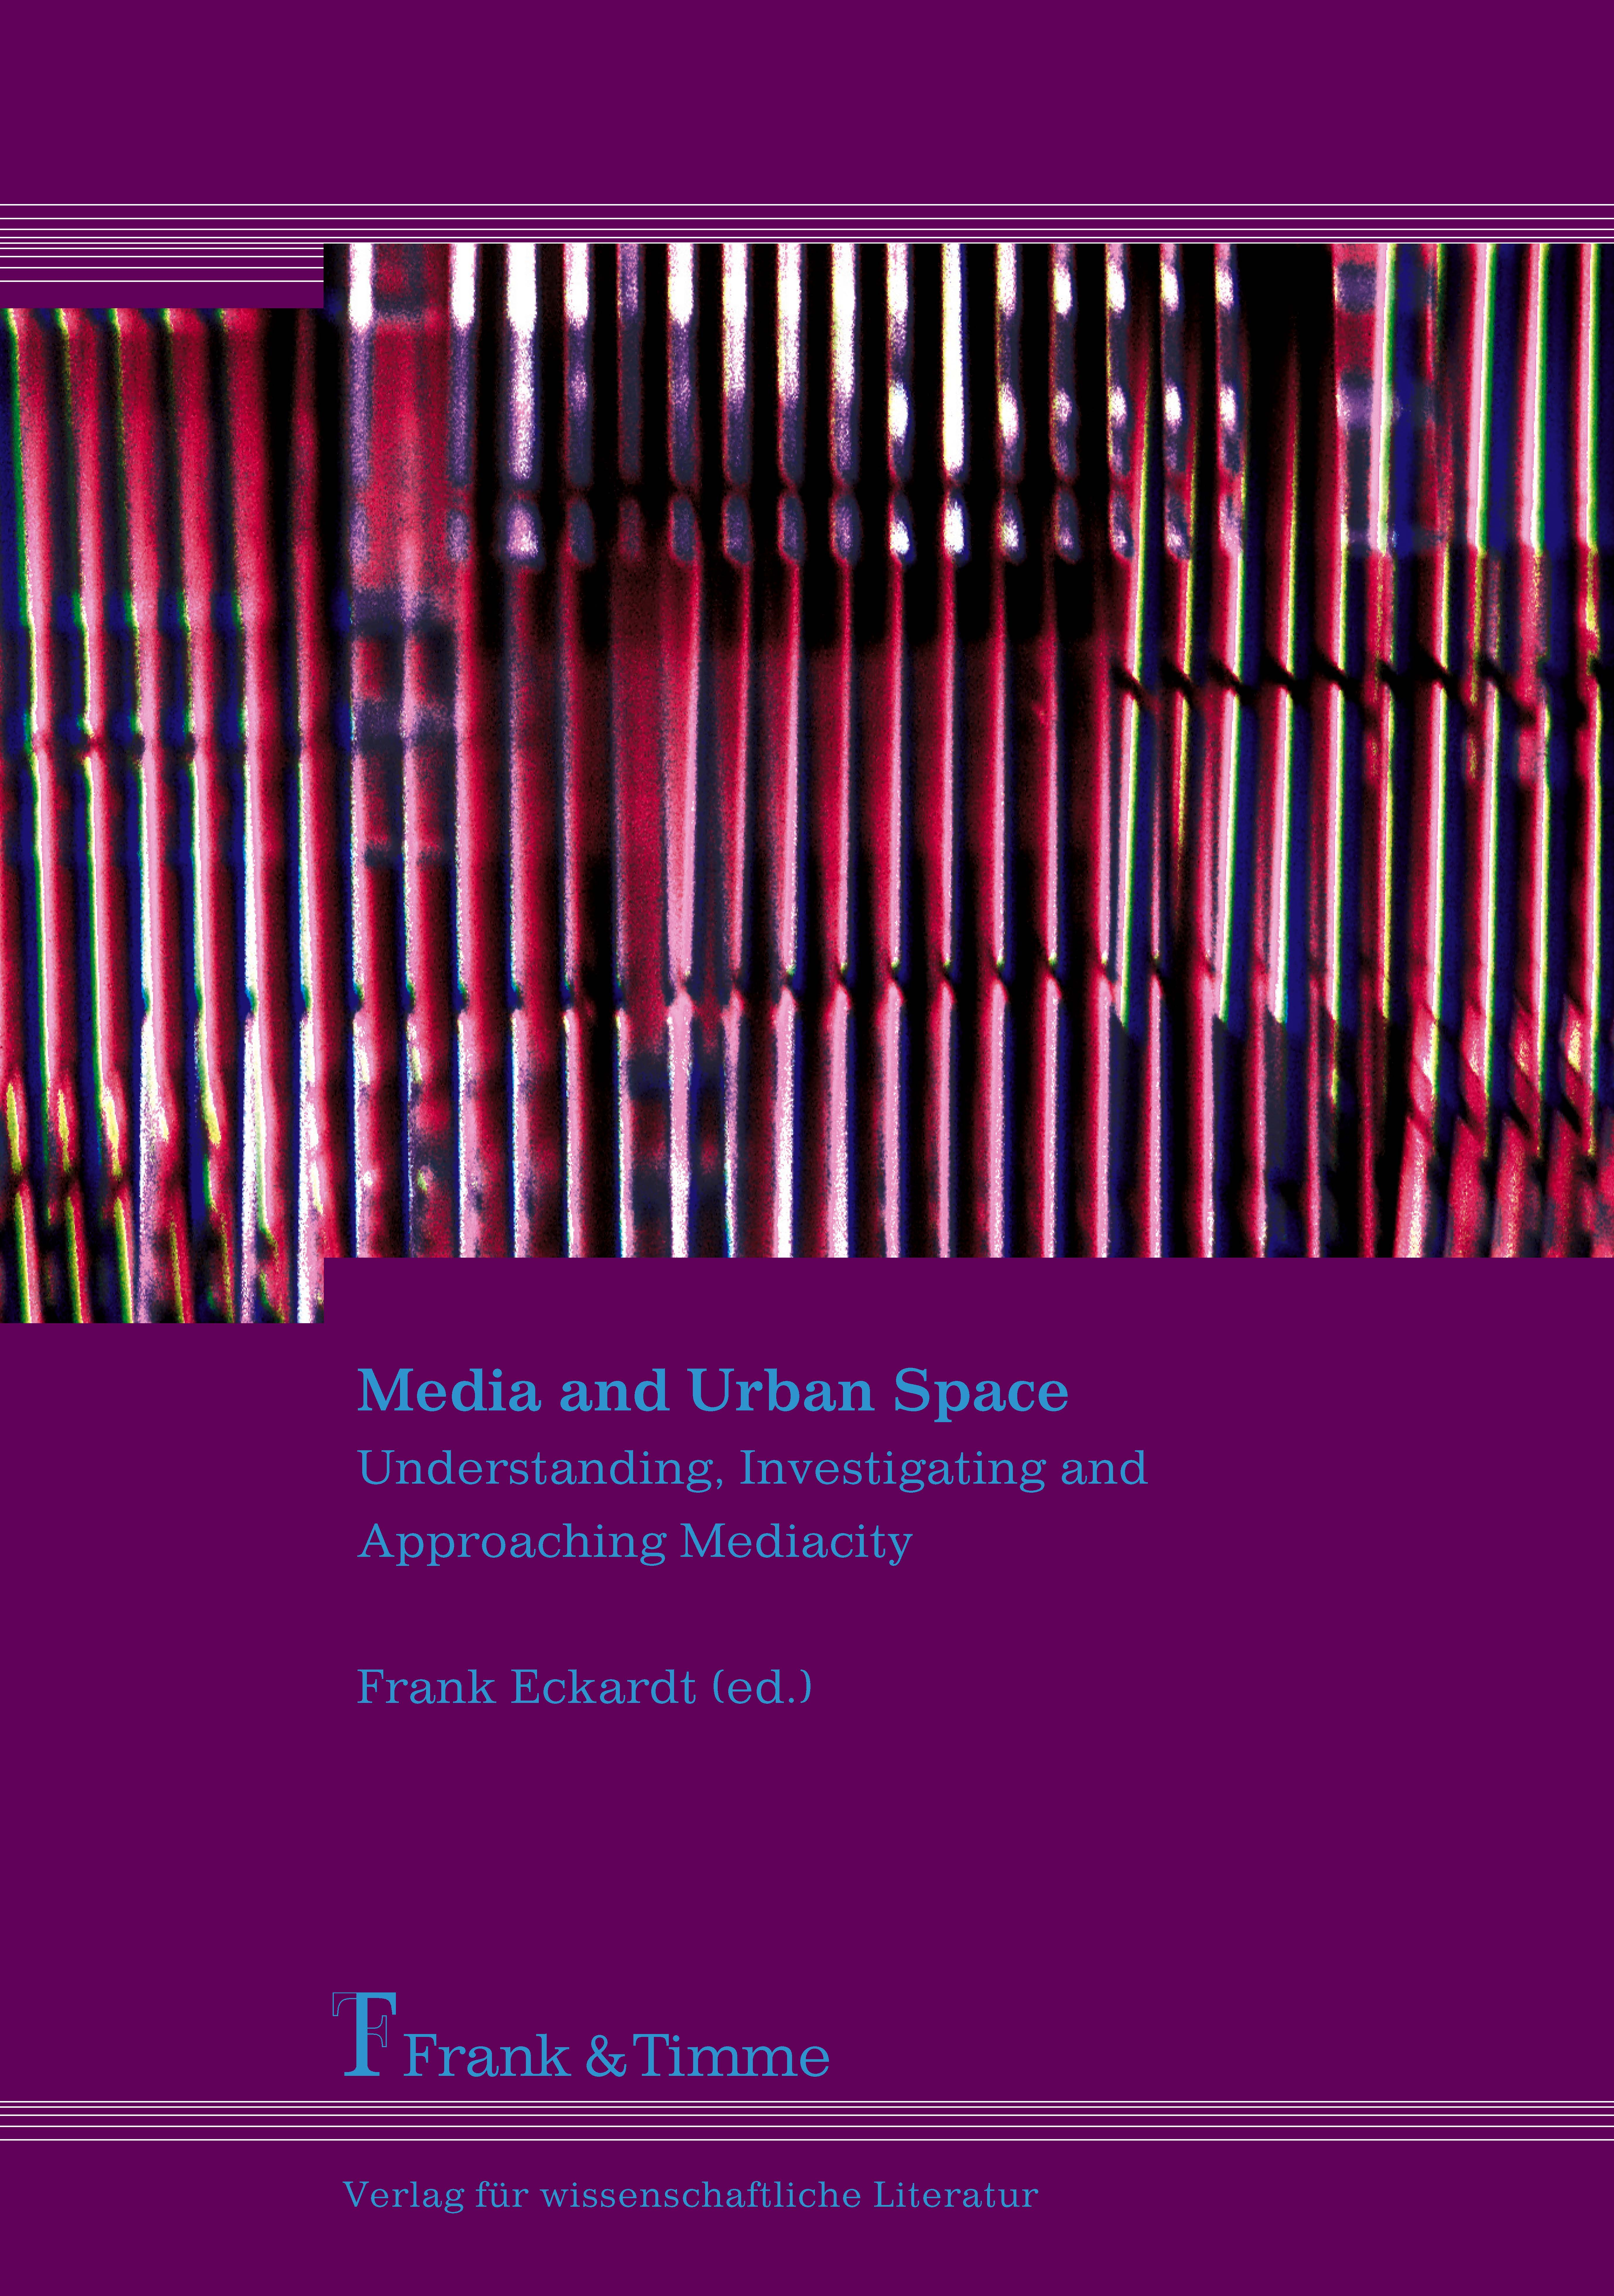 Neu - Media and Urban Space - Frank Eckardt / 9783865961426